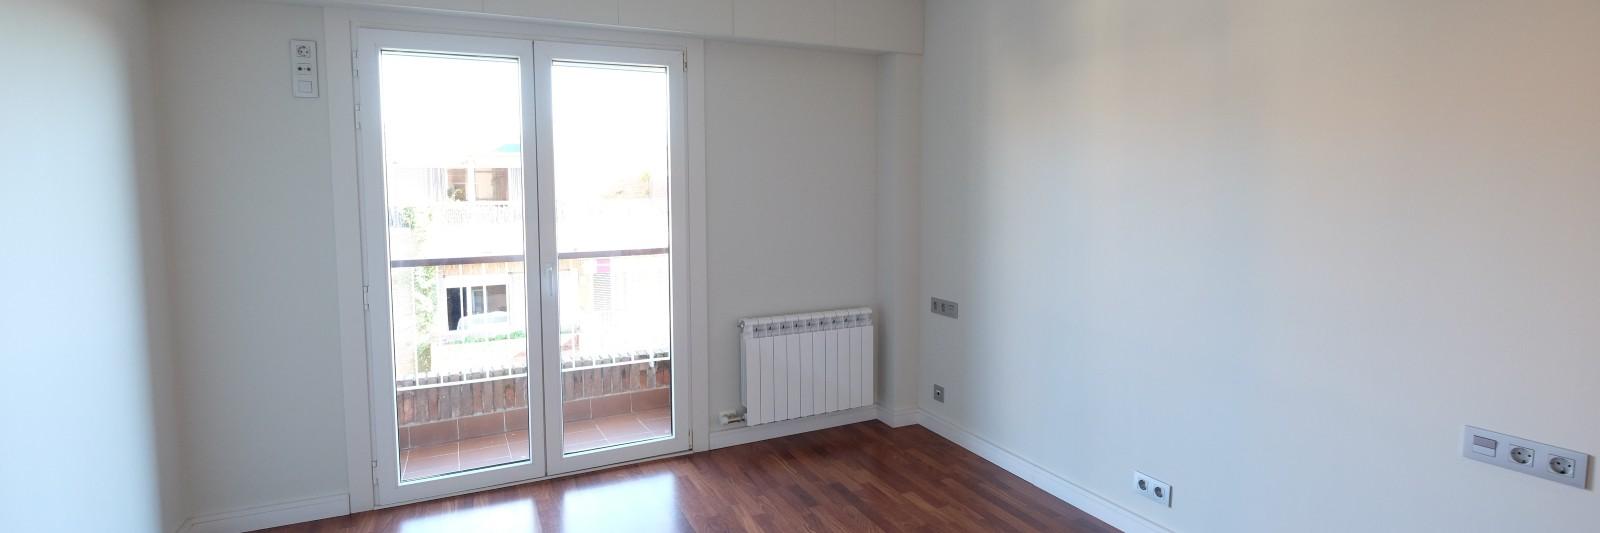 MG Inmobiliaria Barcelona - atico-ganduxer-sarria